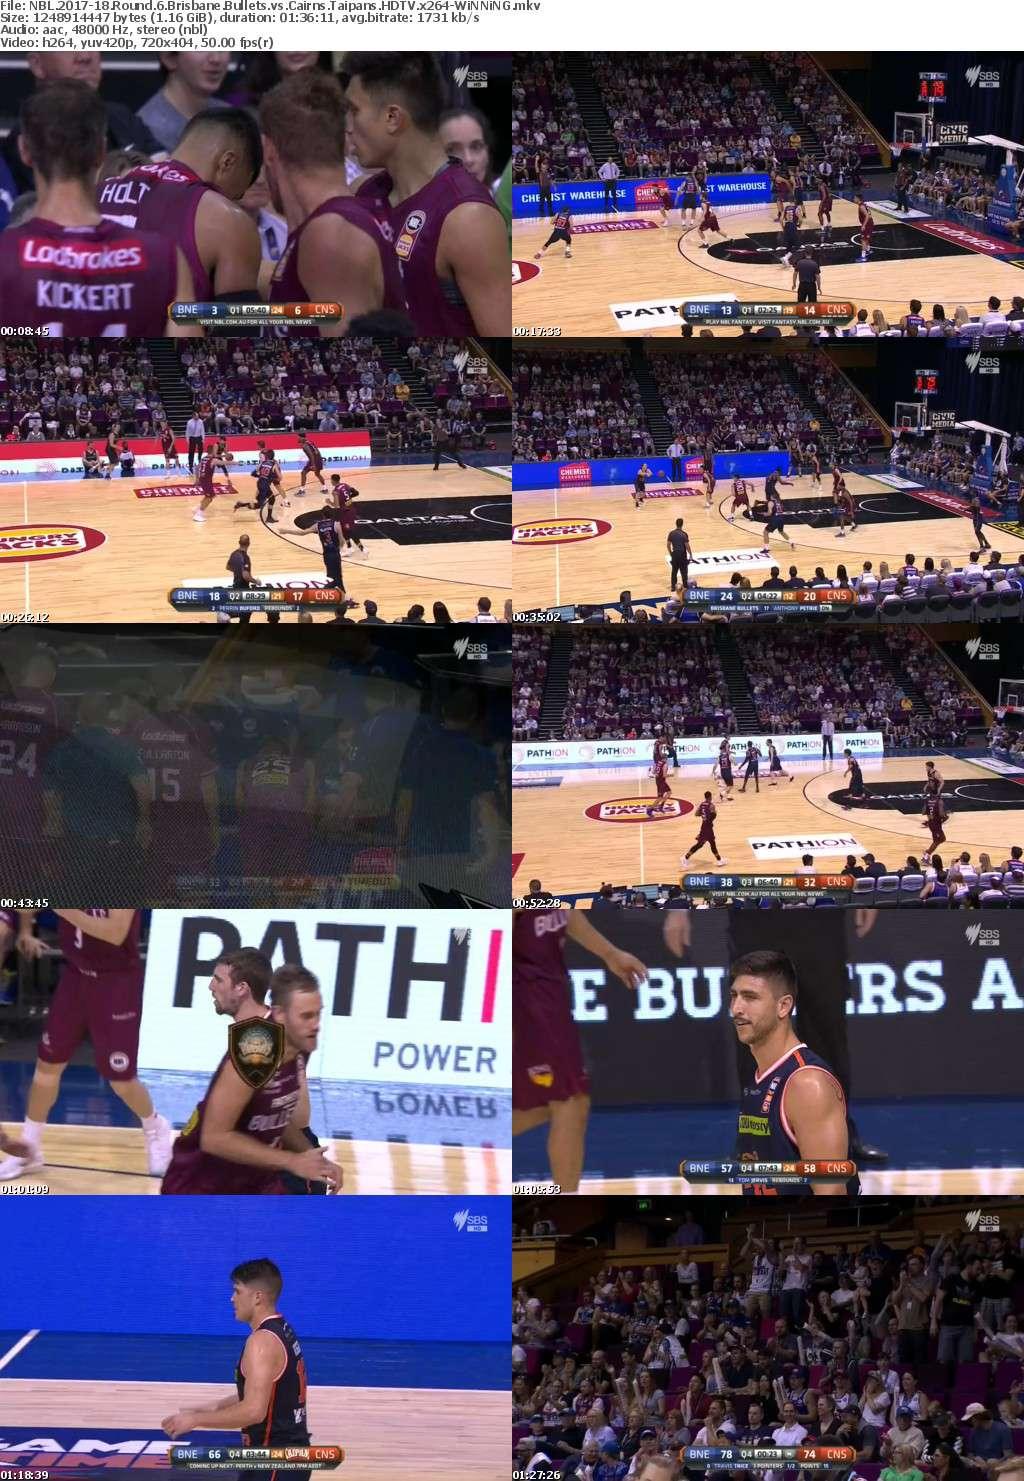 NBL 2017-18 Round 6 Brisbane Bullets vs Cairns Taipans HDTV x264-WiNNiNG